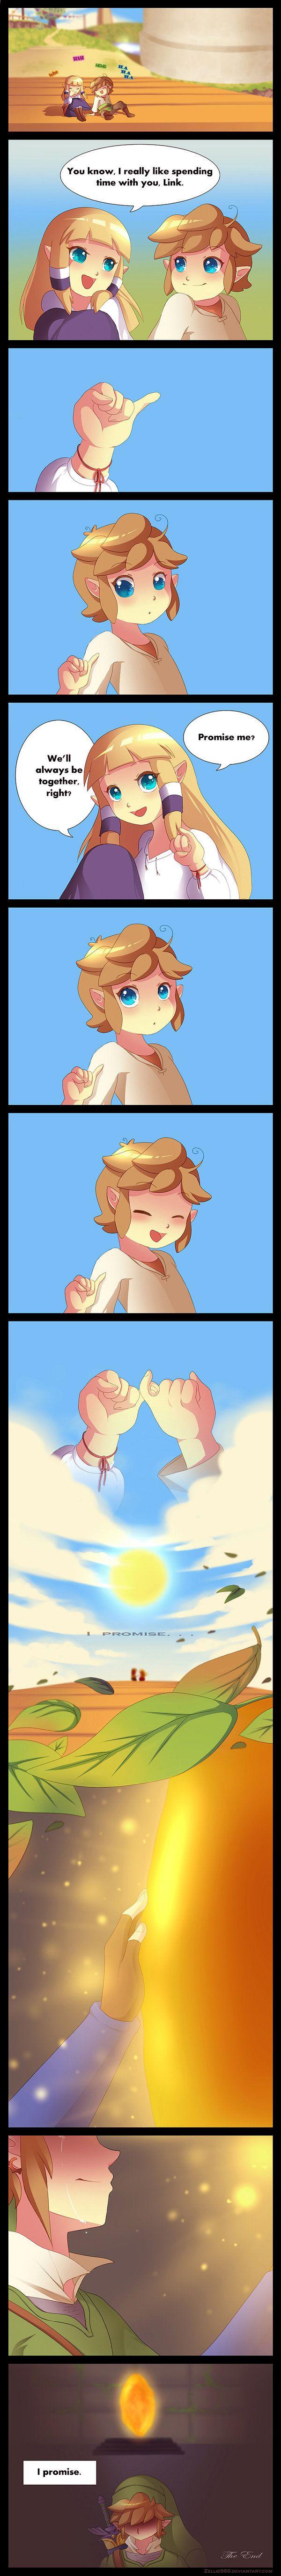 Zelda and Link comic - Legend of Zelda // Awww. // #LegendofZelda #LOZ #Comics #Cute #Kawaii #fanart